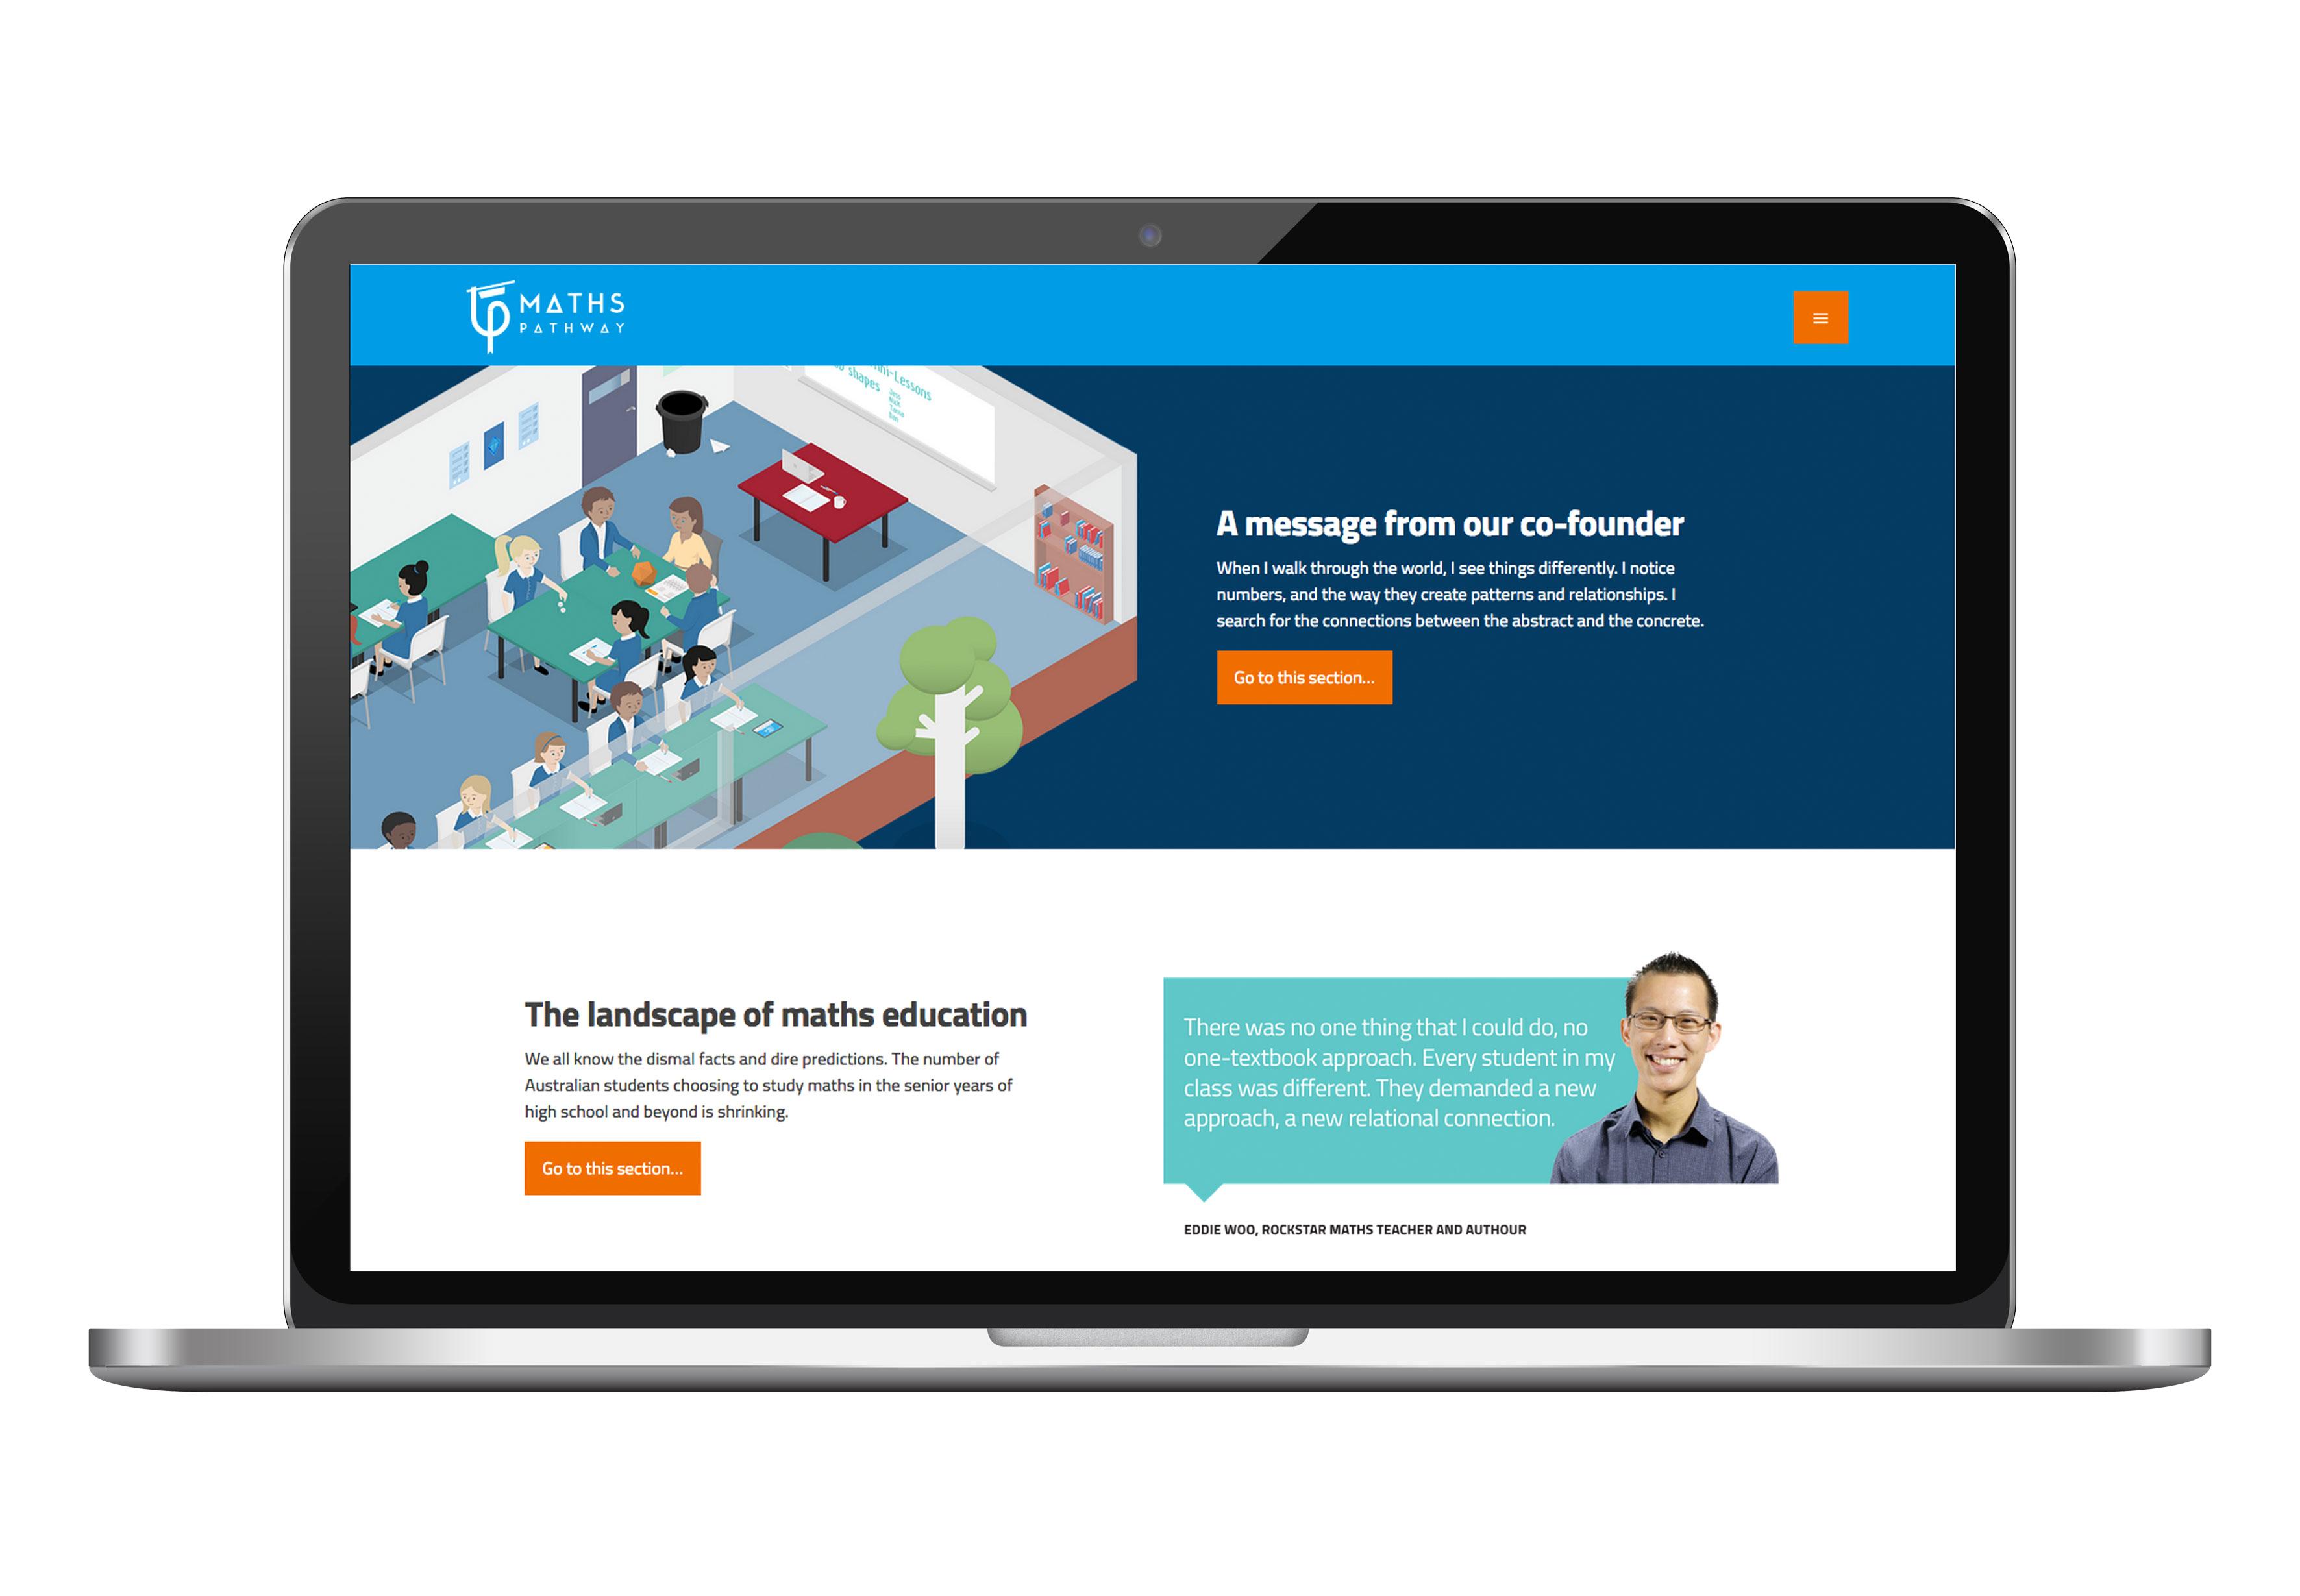 Maths Pathway website shown on desktop